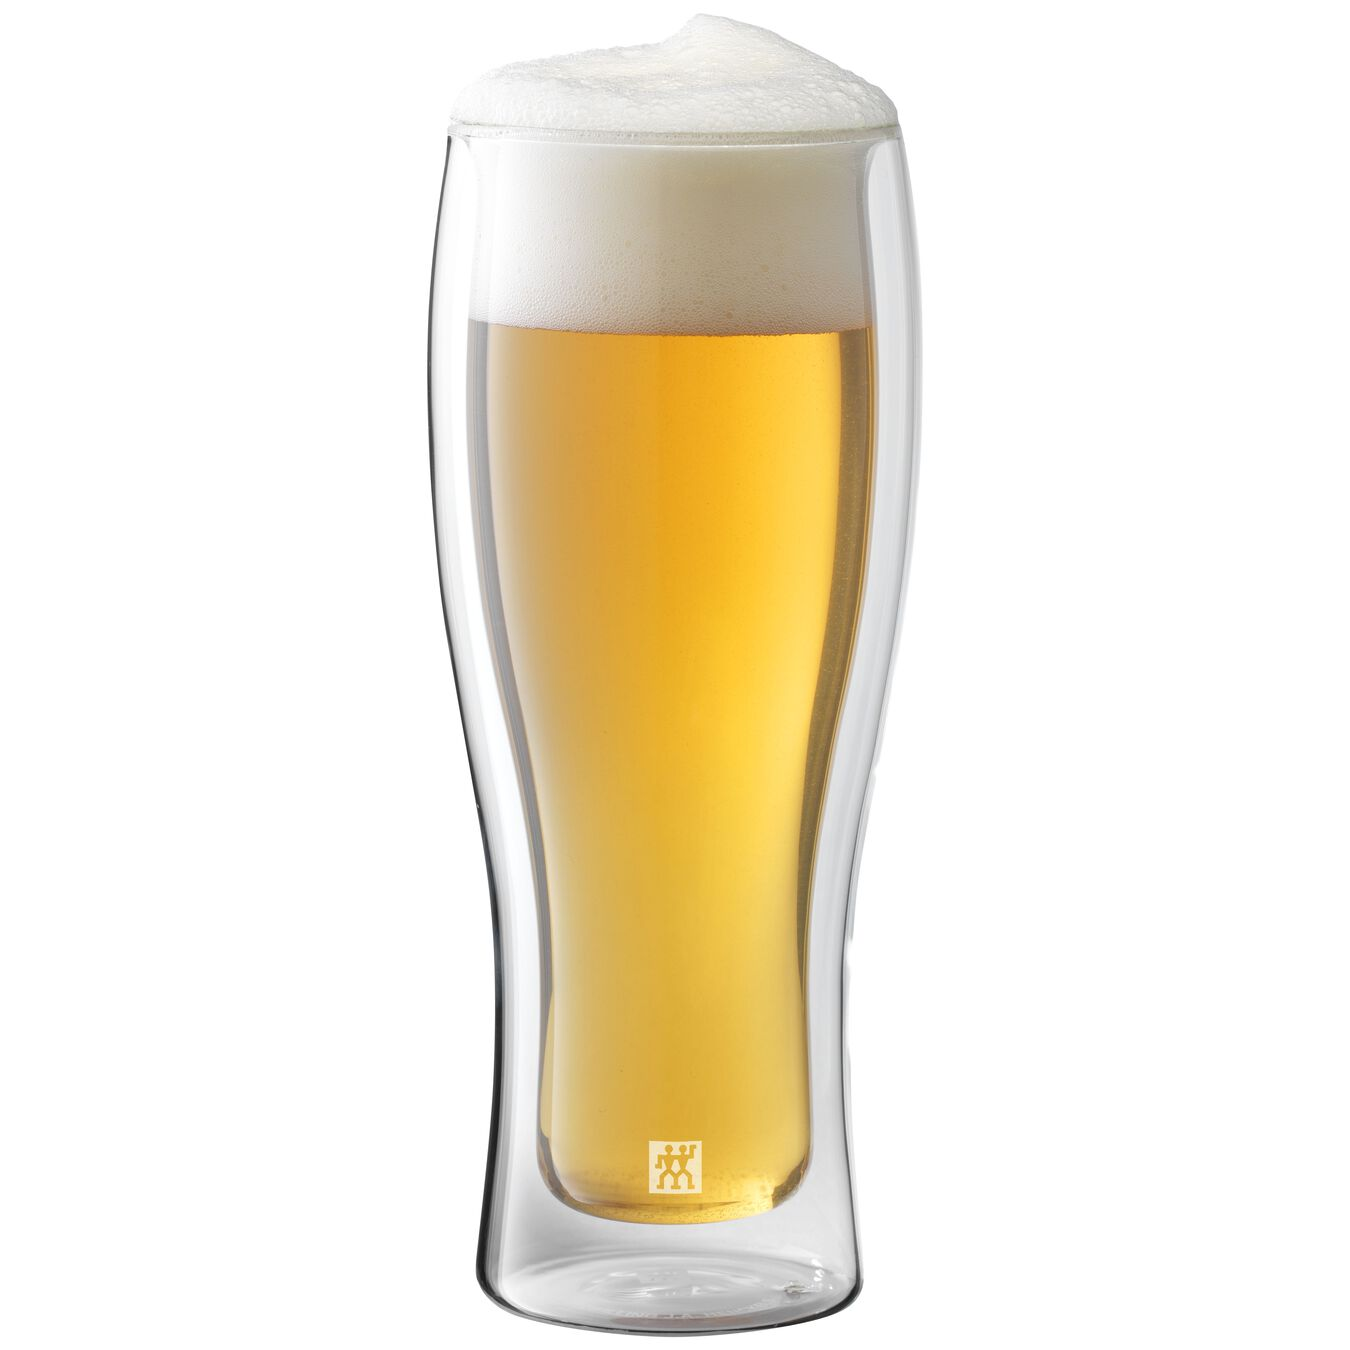 4 Piece Beer glass set,,large 4